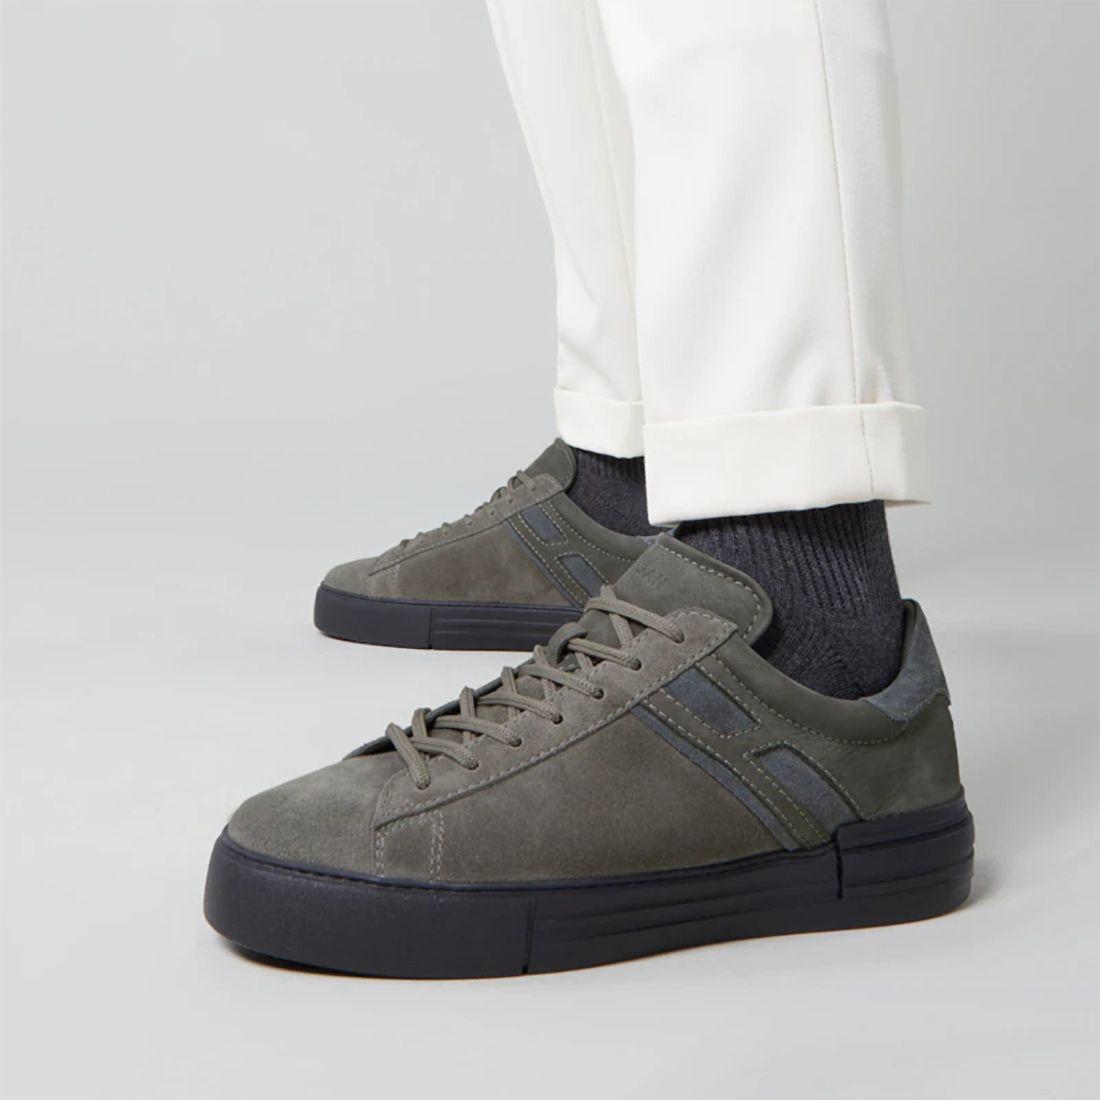 sneakers uomo hogan hxm5260cw00qcl8p38 9148